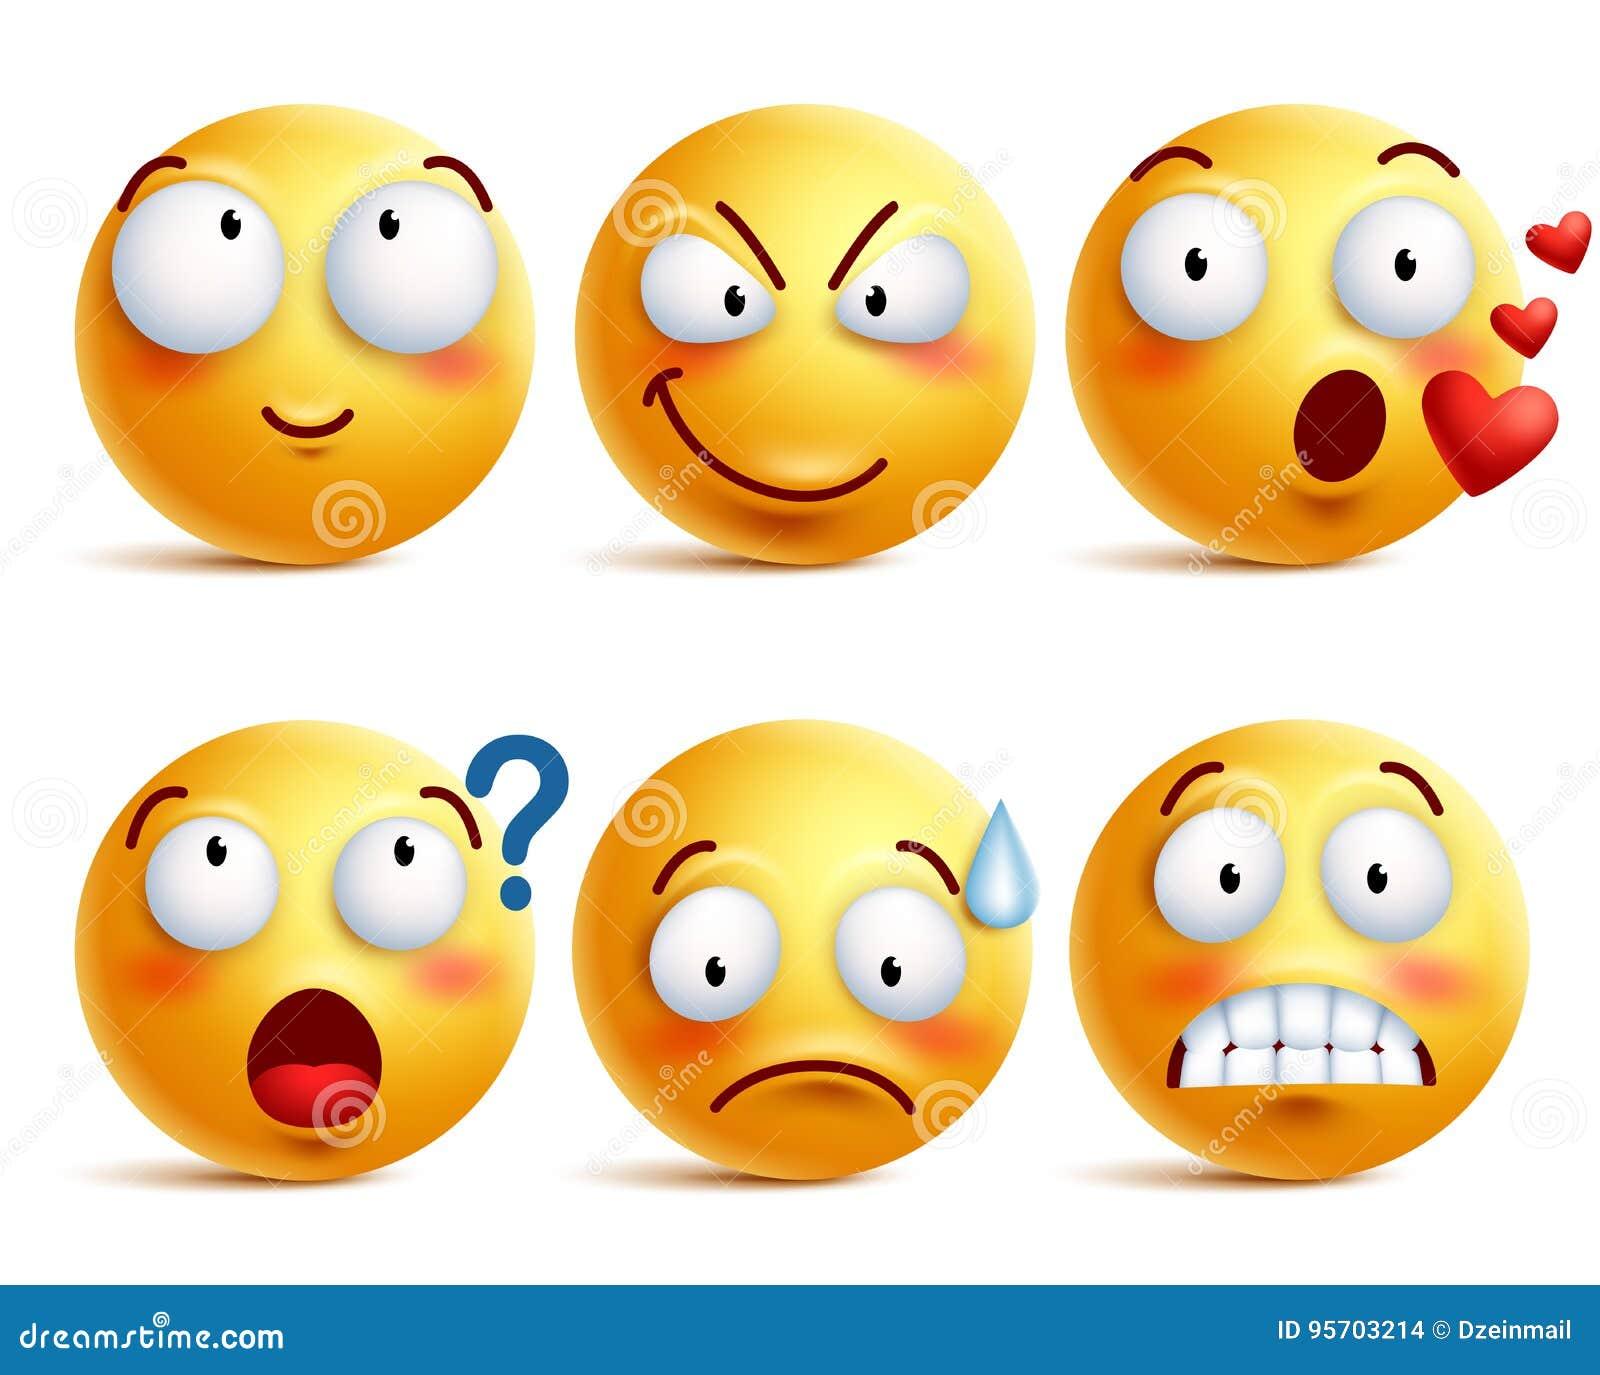 Smileys Vector Set Yellow Smiley Face Or Emoticons With Facial